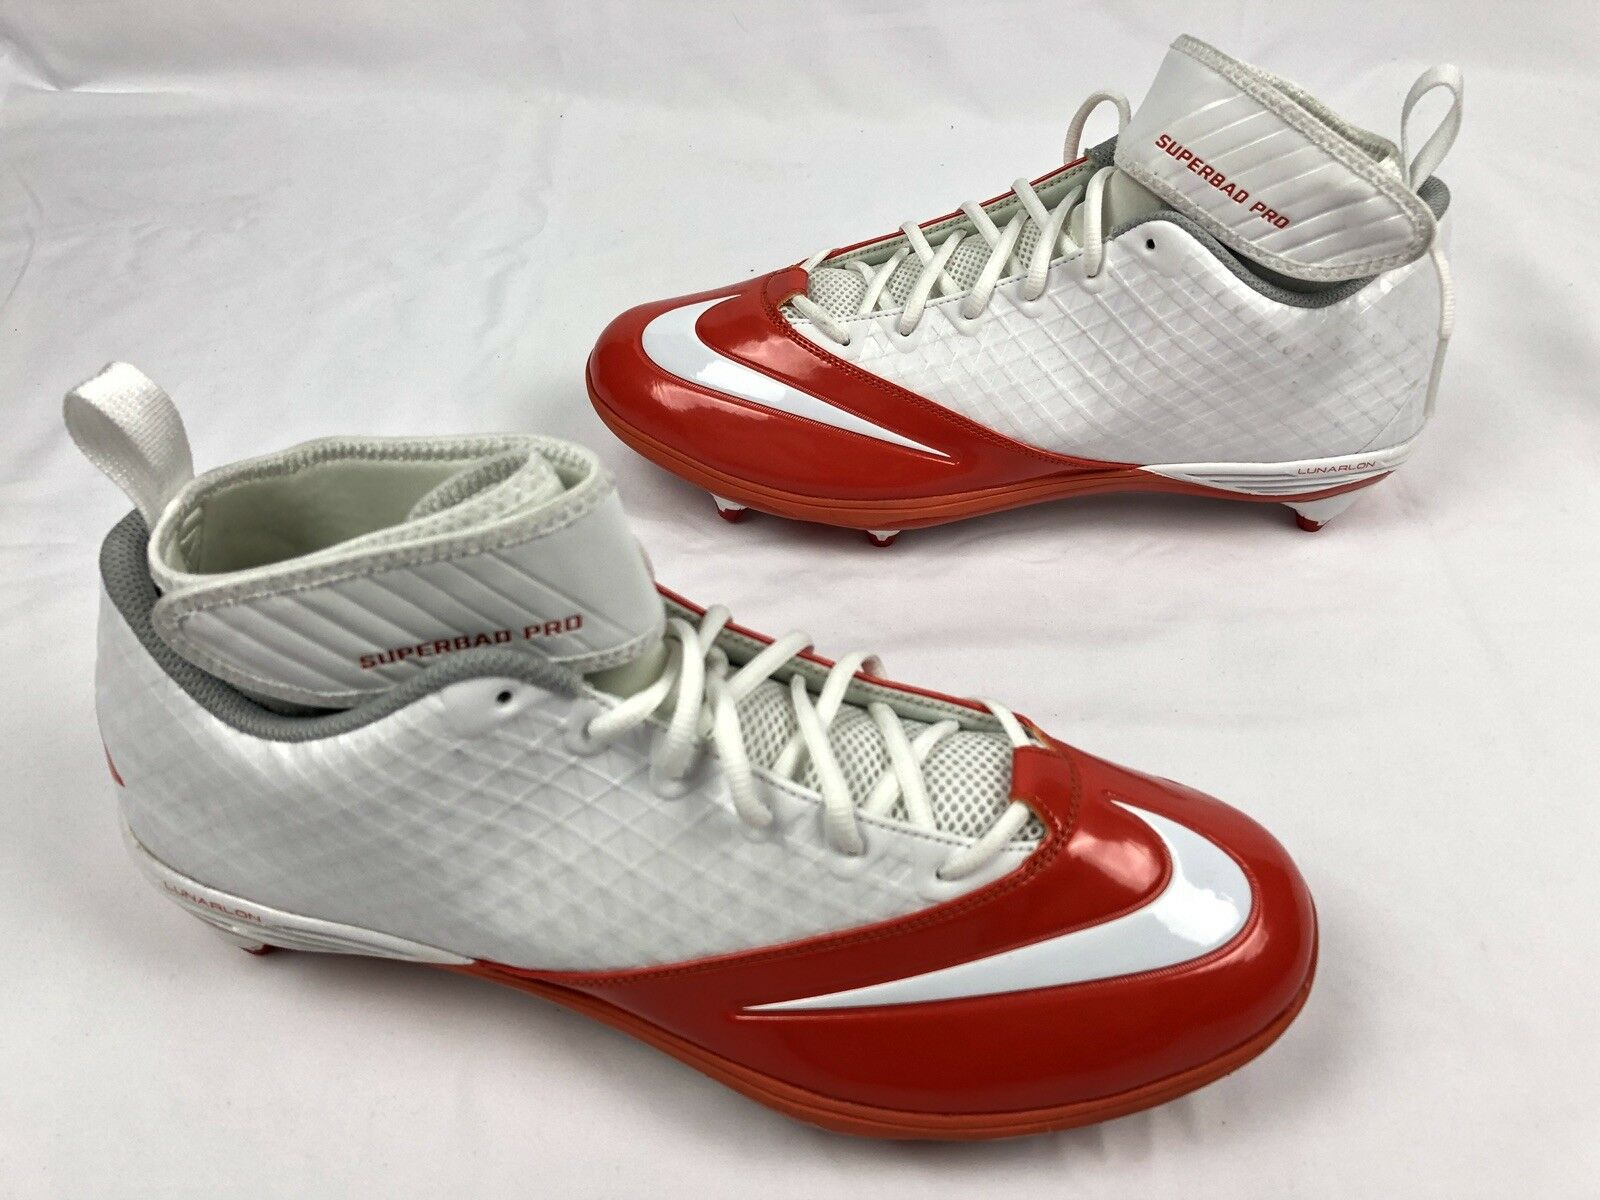 Nike Lunar Superbad Pro TD Mid Mens Football Cleats 511328 116 orange White 14